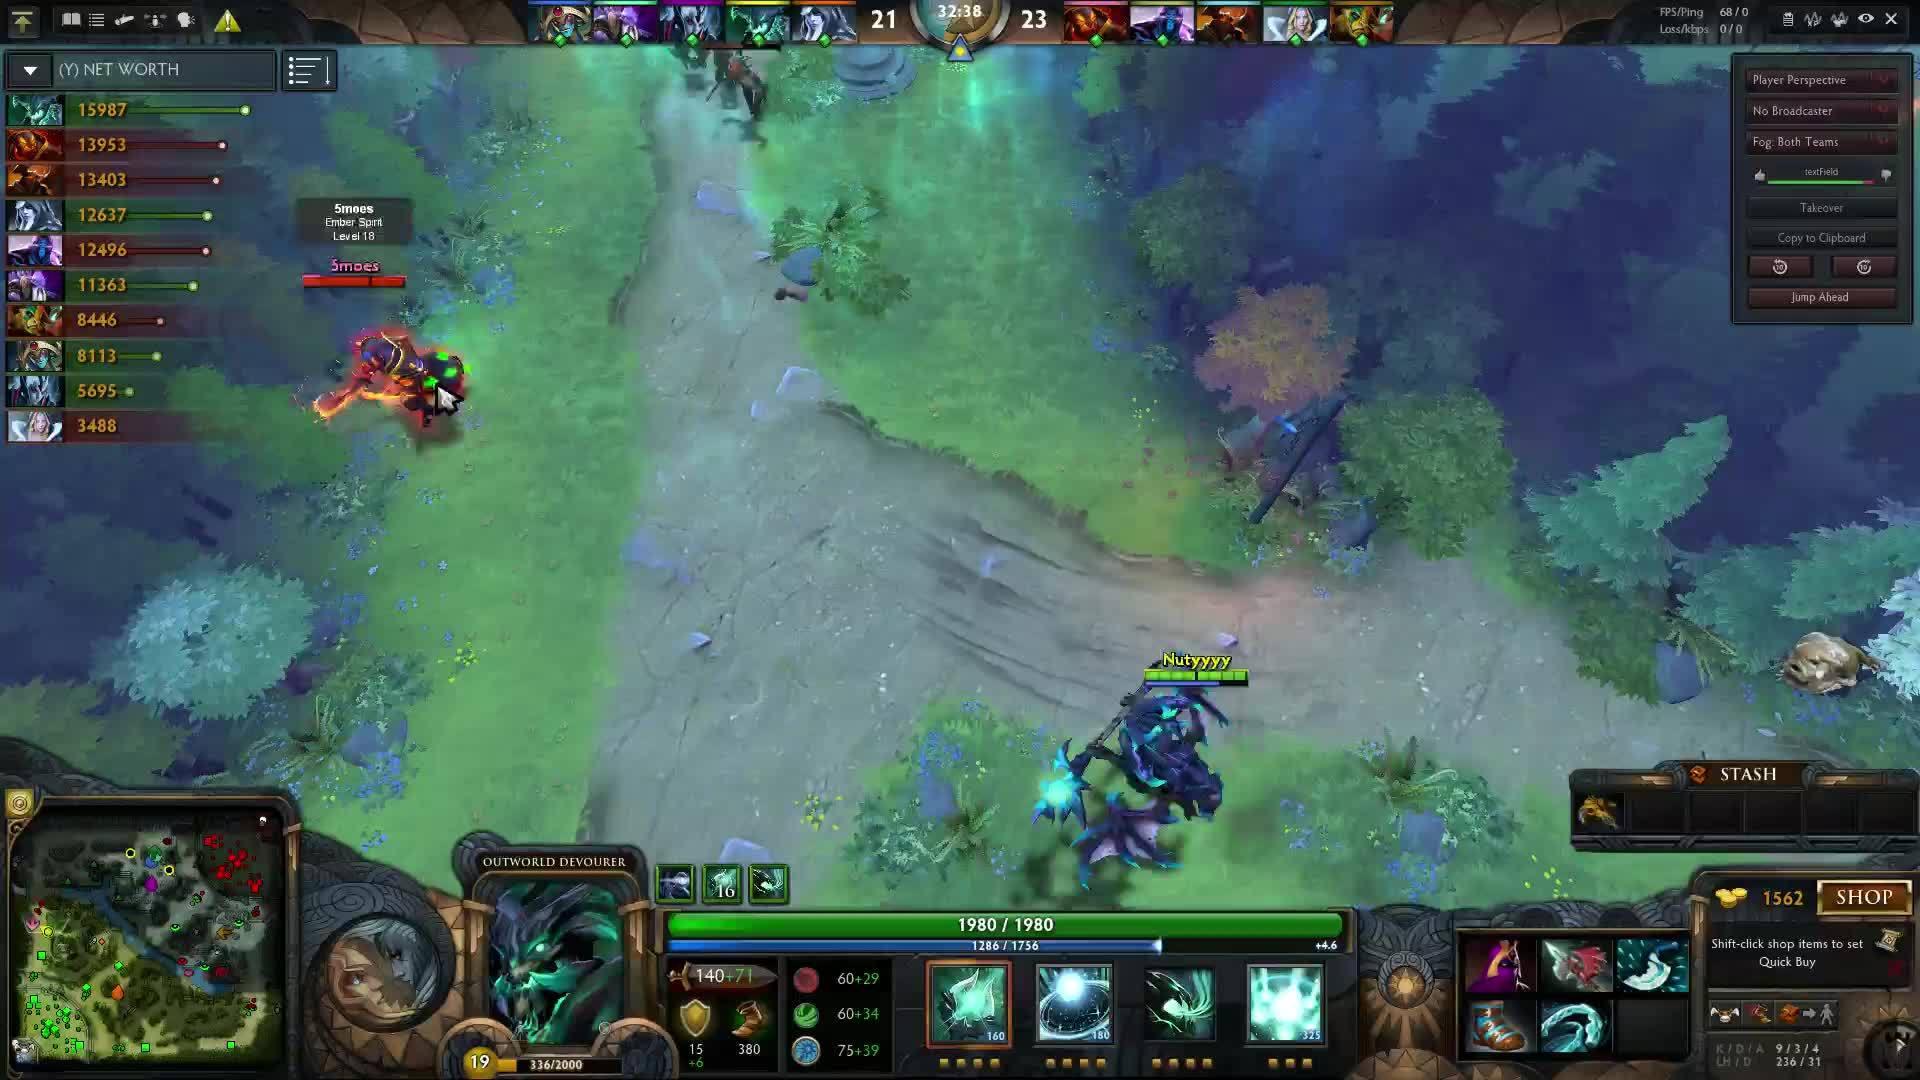 copypasta, dota2, stobuilds, Dragon Lance vs Ember Spirit GIFs